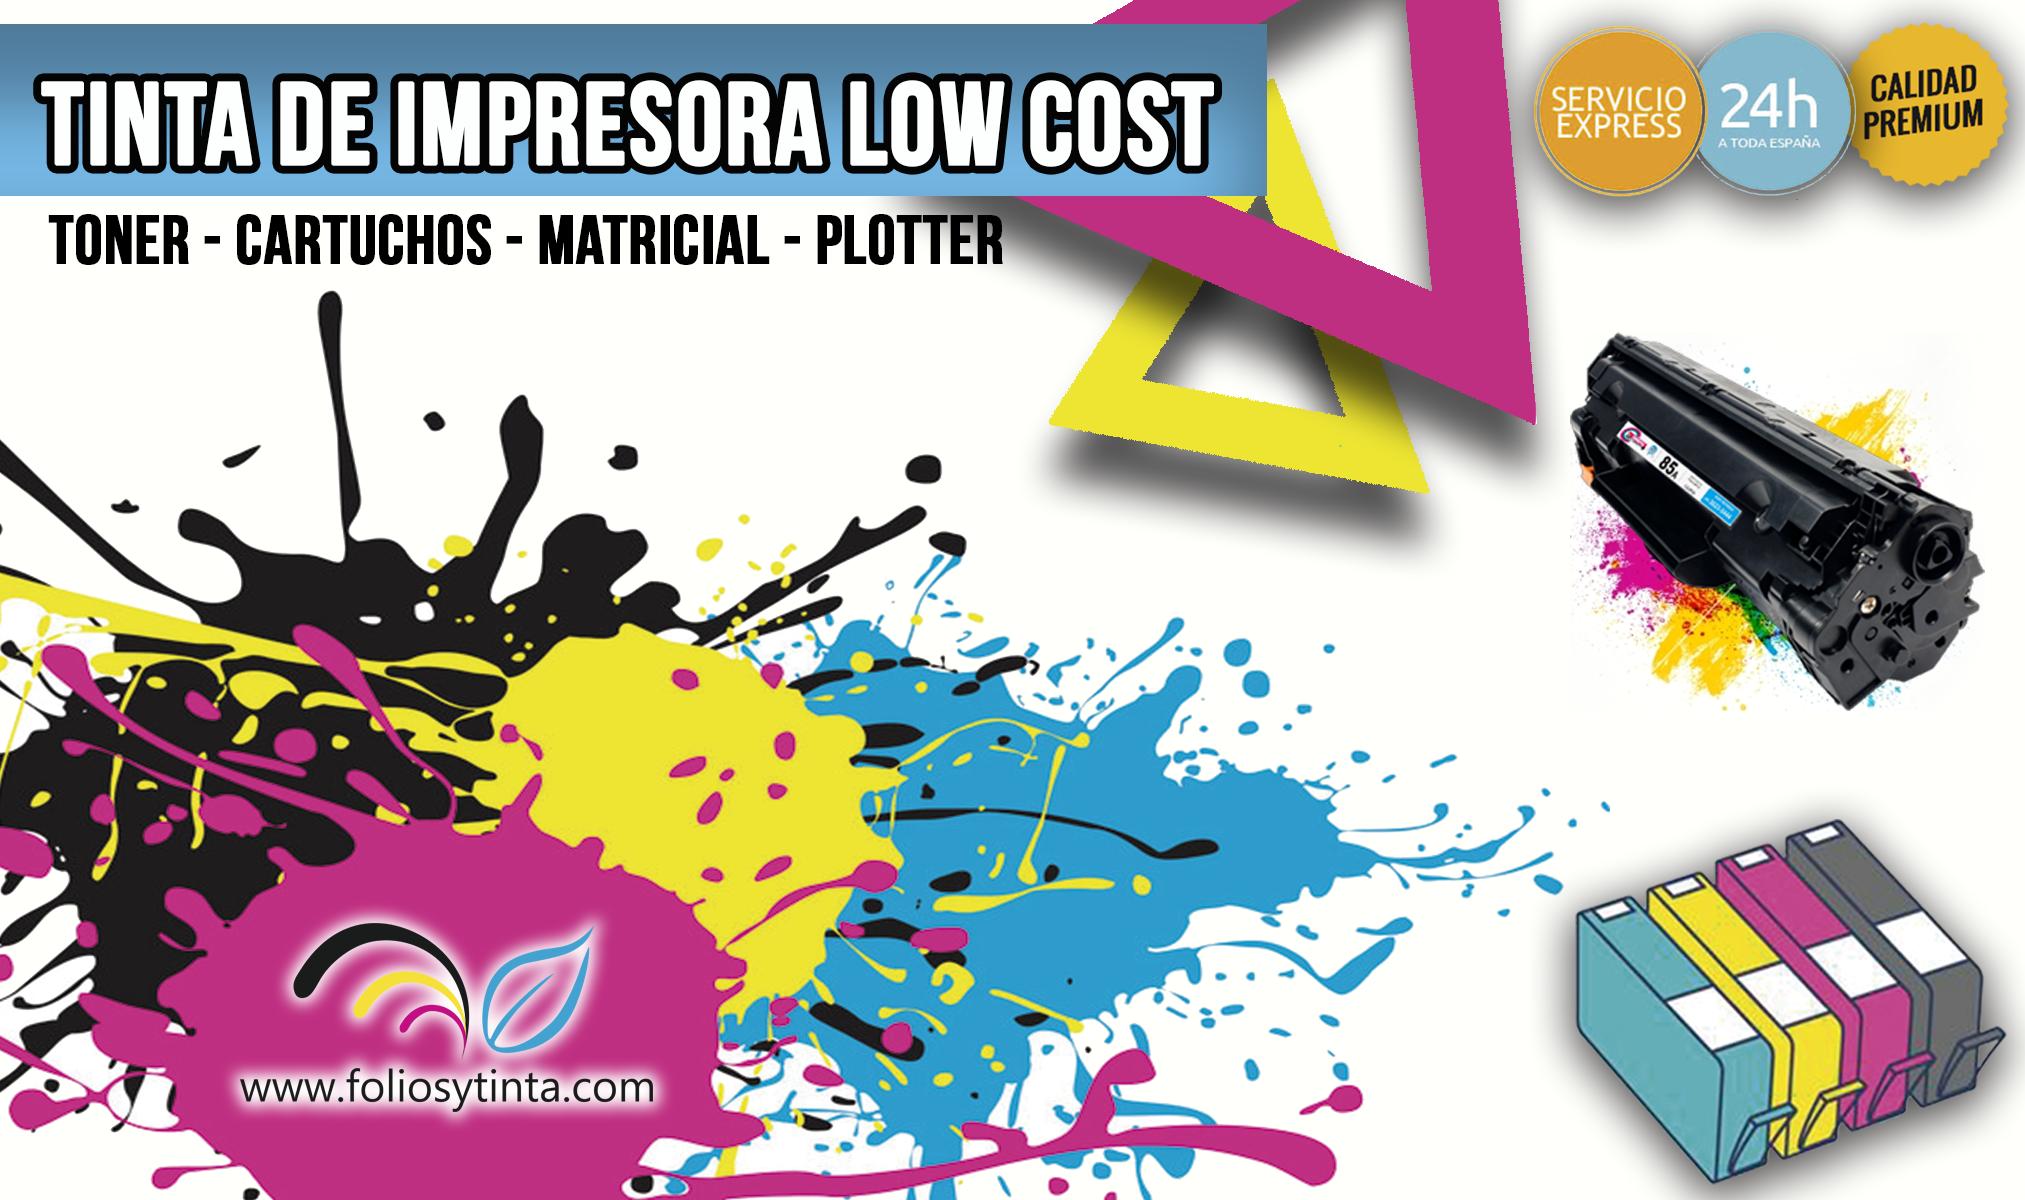 TINTA DE IMPRESORA LOW COST